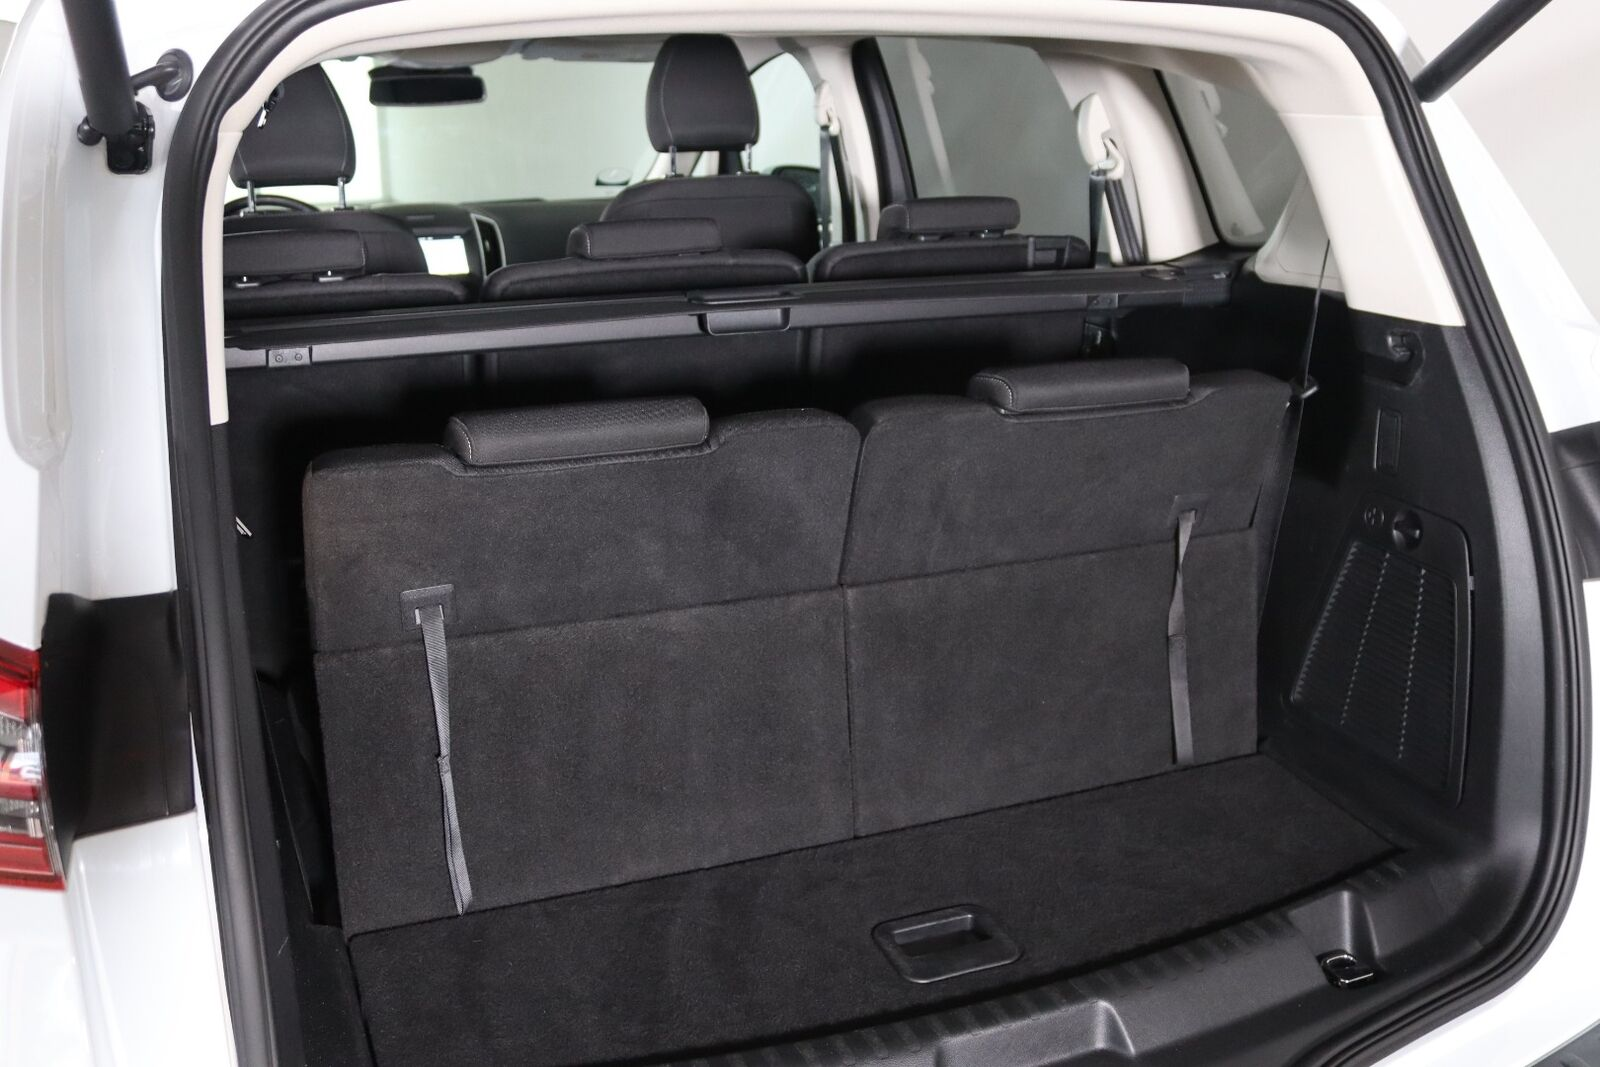 Ford S-MAX 2,0 TDCi 210 Titanium aut. 7prs - billede 7